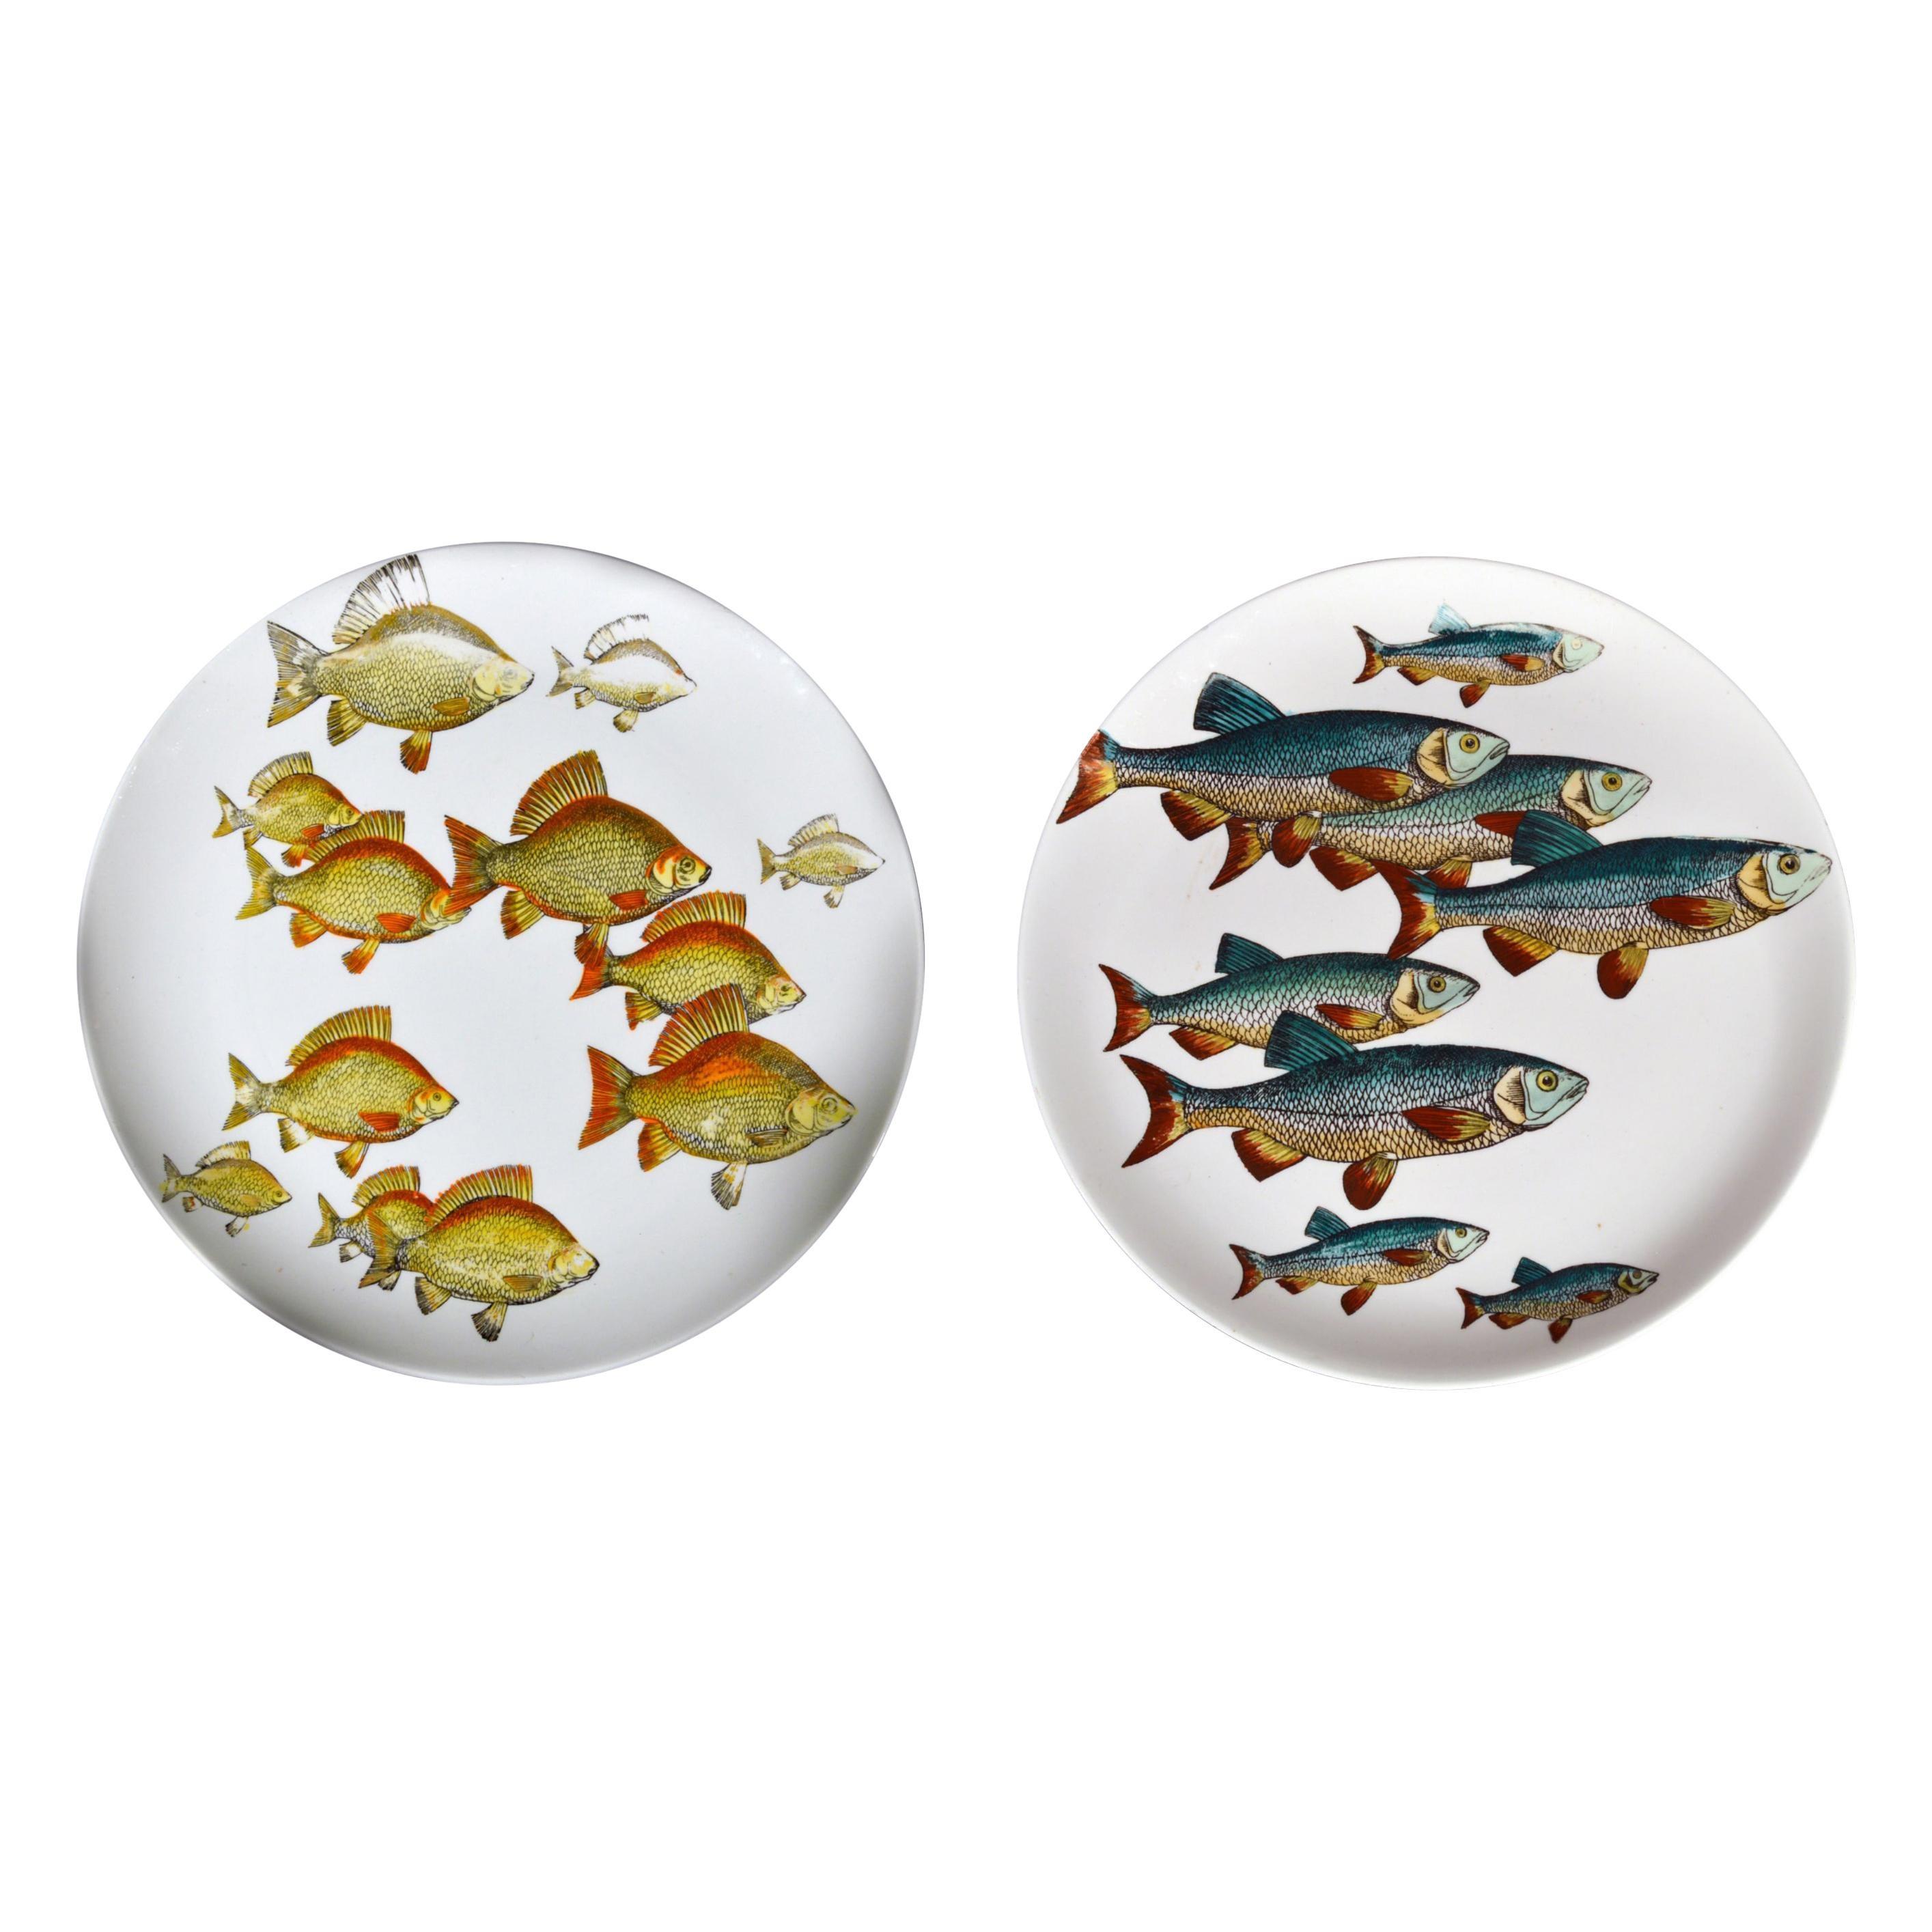 Pair of Rare Piero Fornasetti Fish Plates, Pesci pattern or Passage of Fish